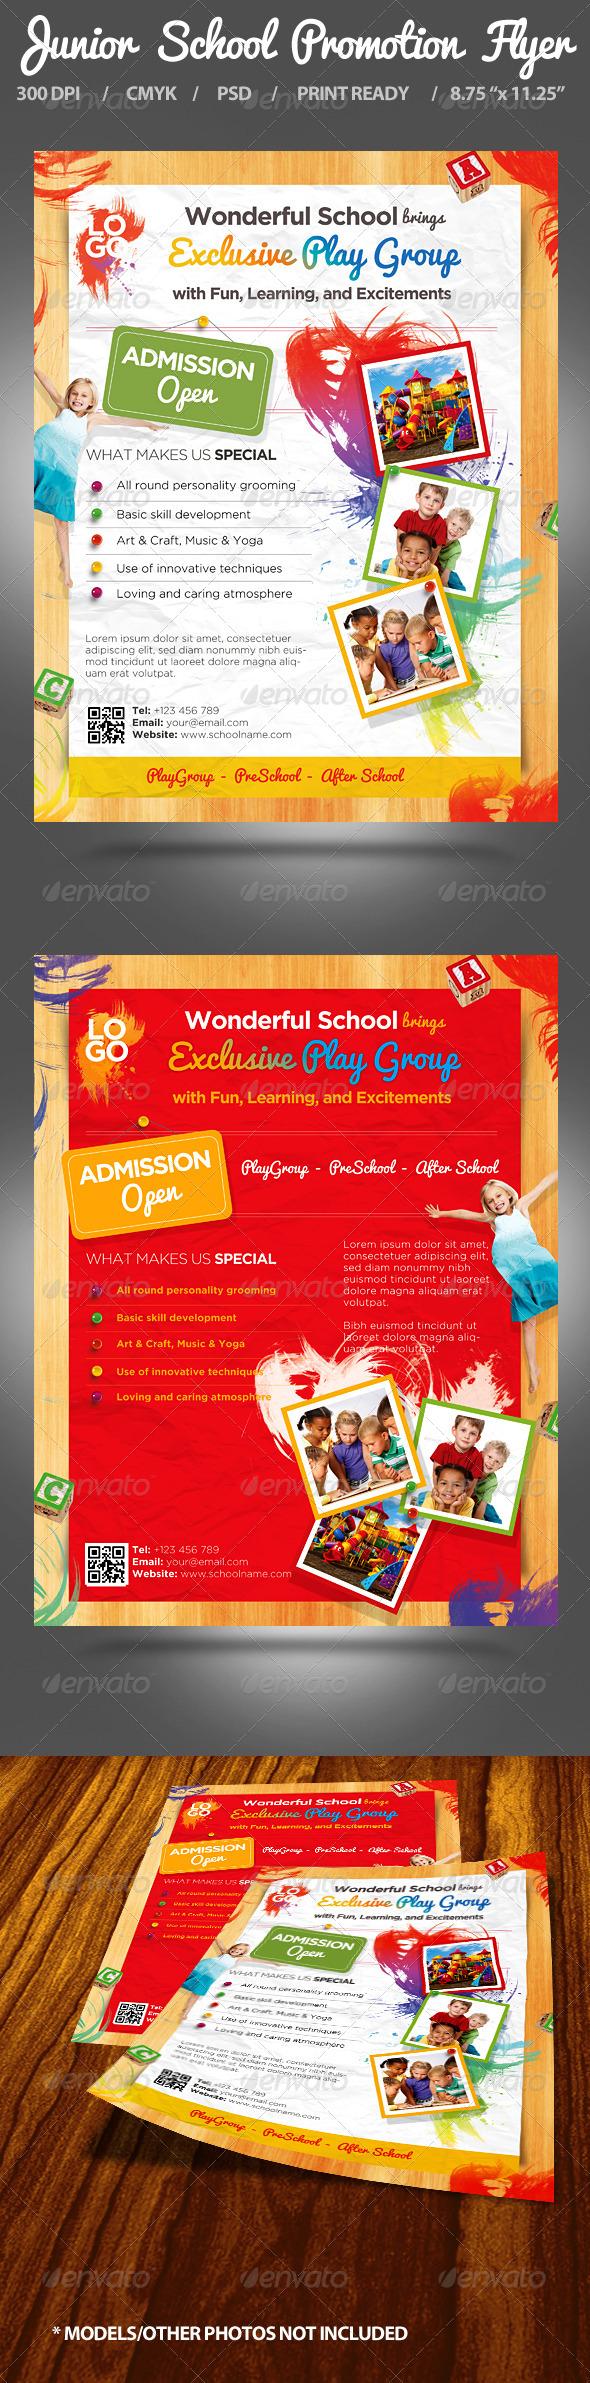 GraphicRiver Junior School Promotion Flyers 5046644